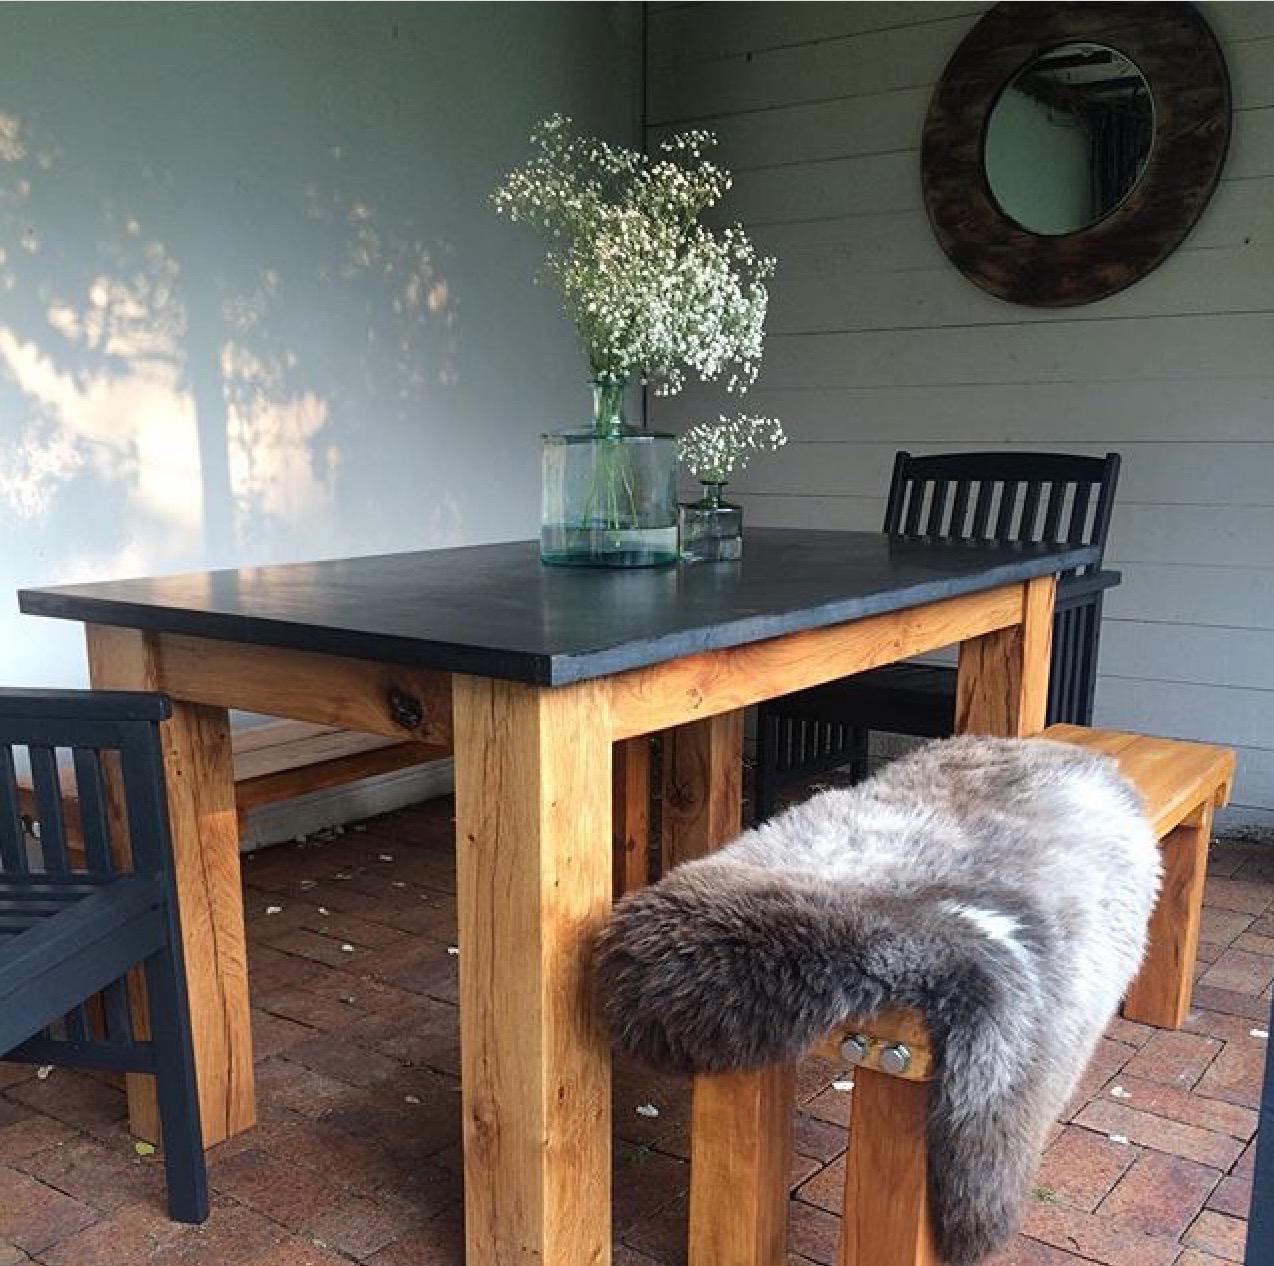 Welsh slate and oak table